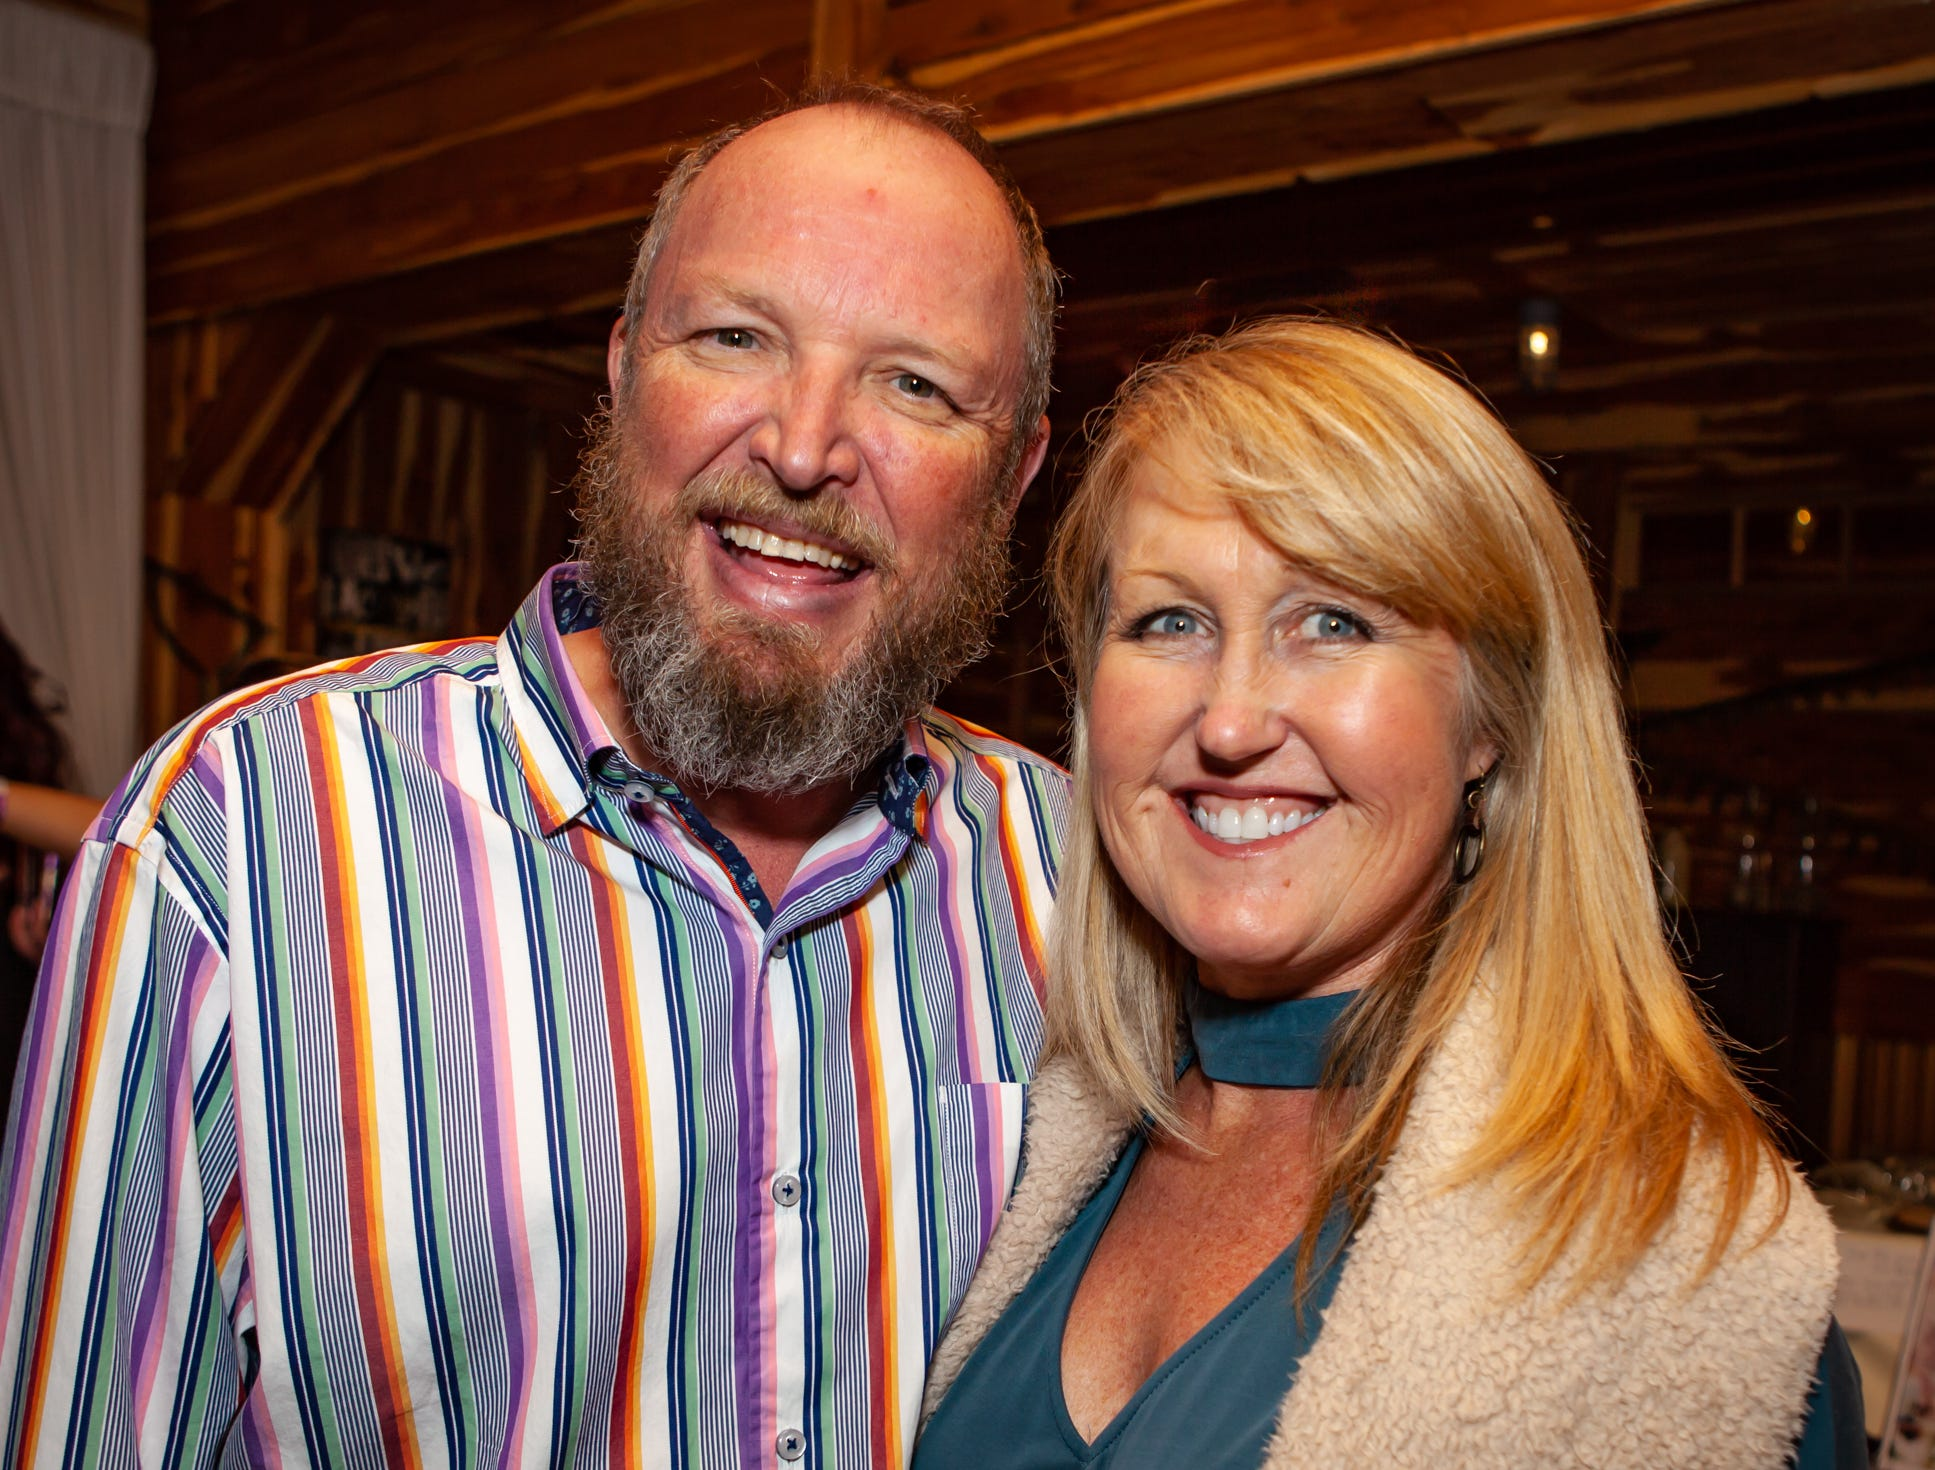 Boots and Brews: Glen Linthicum and Karen McMahon